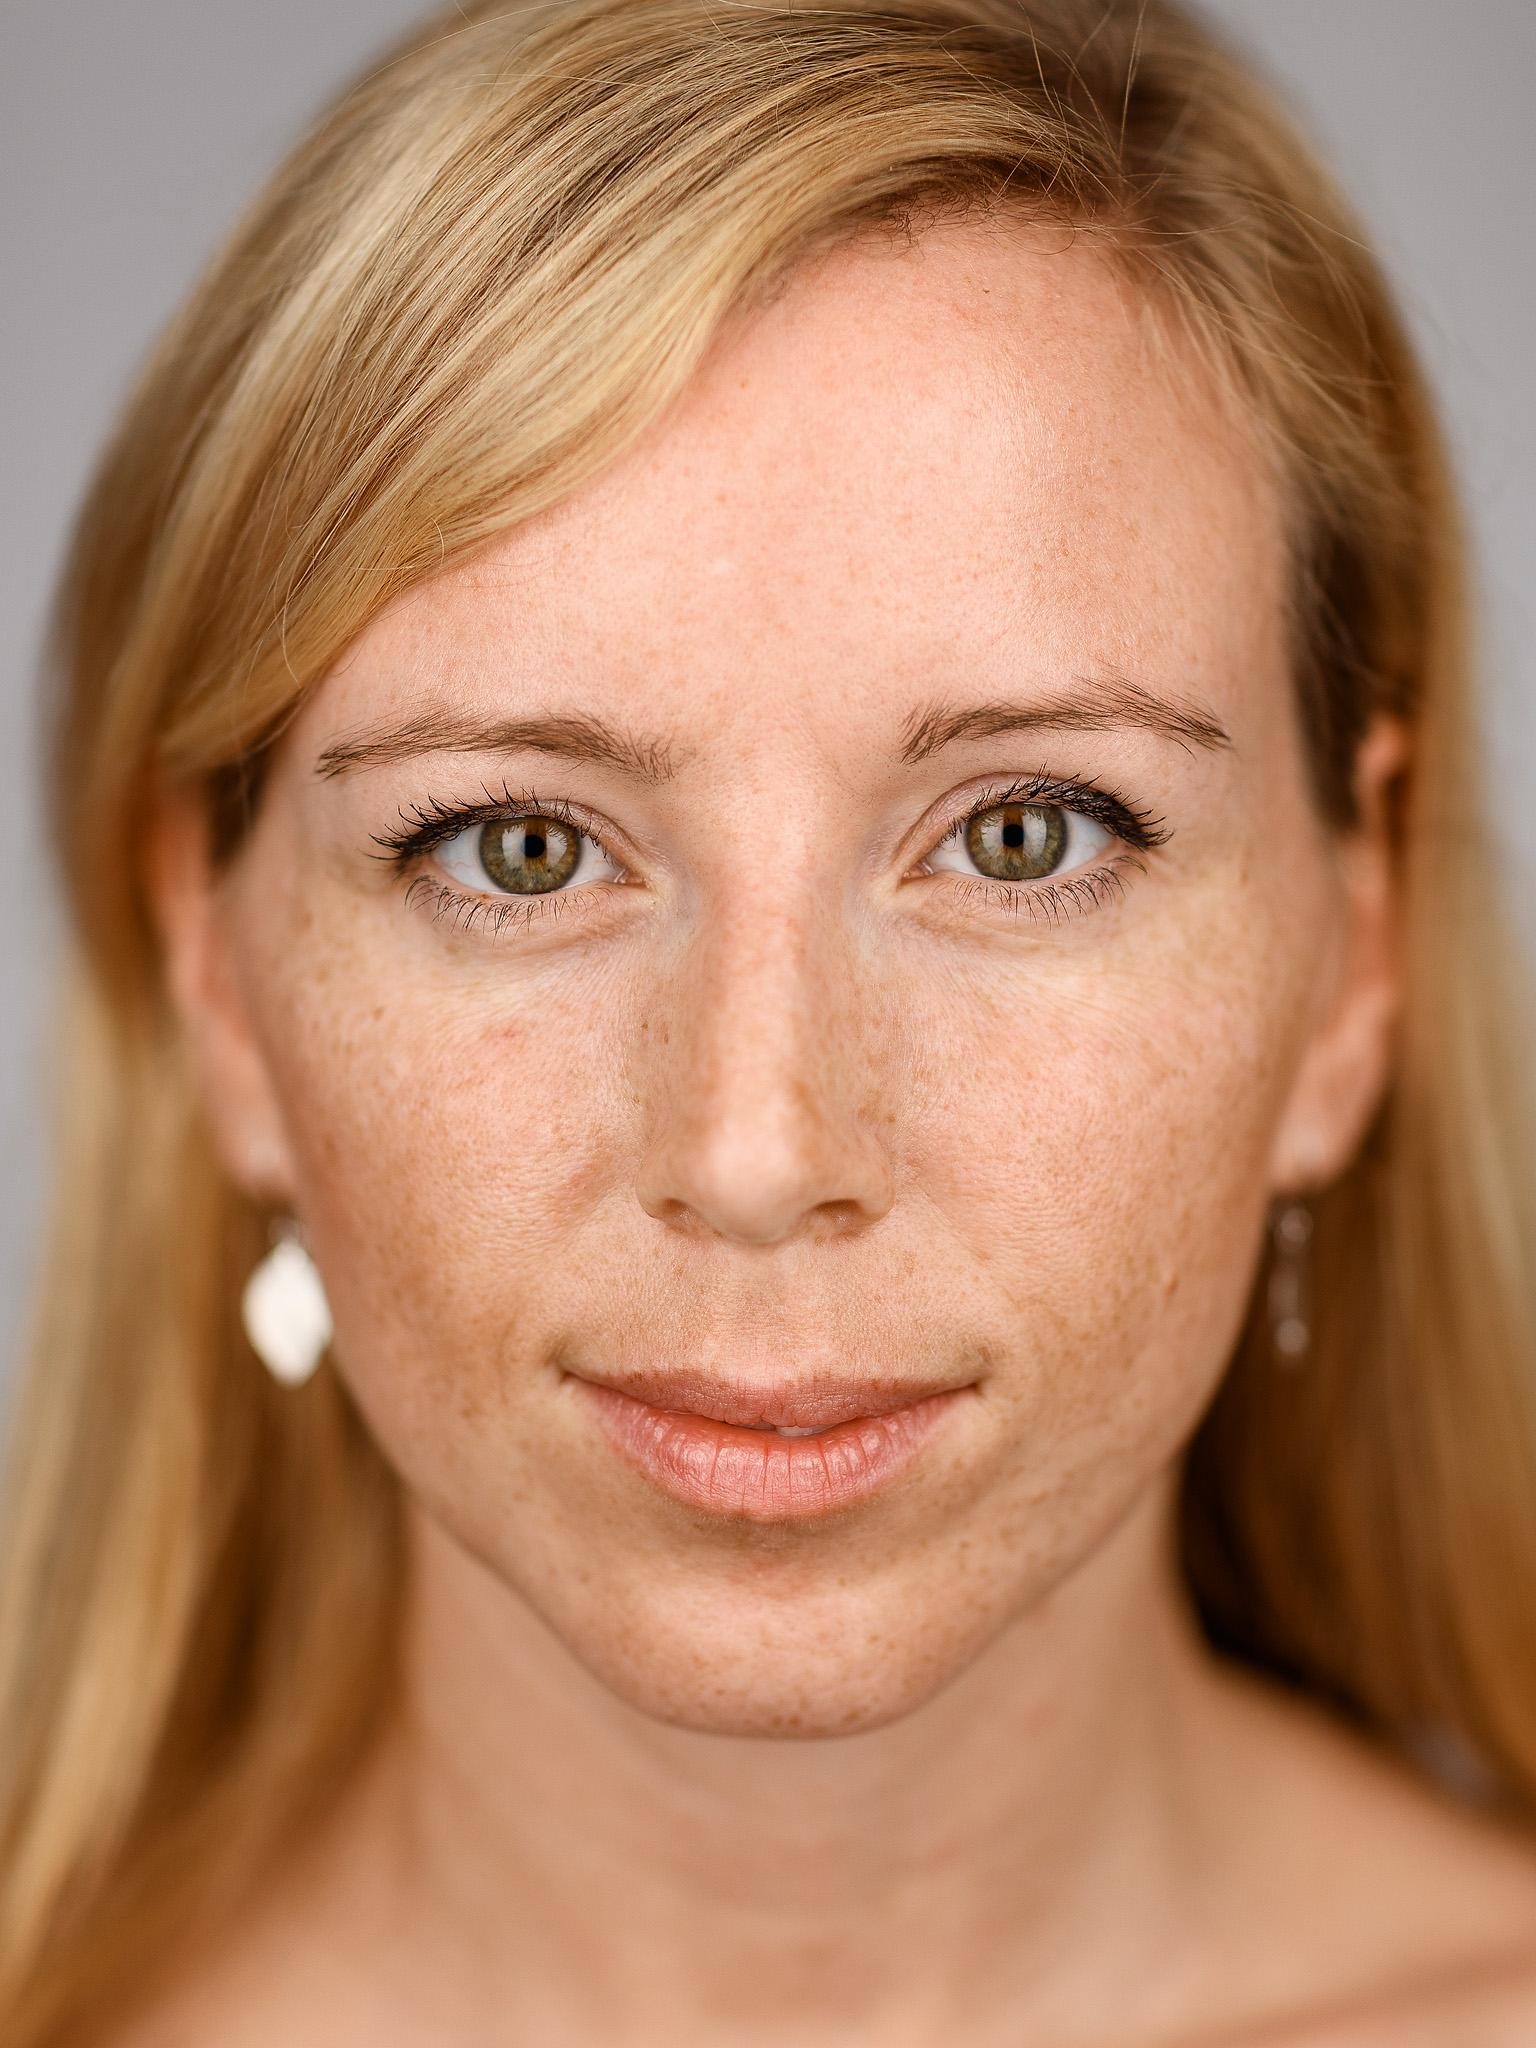 Aileen_Jan Cornelis.jpg